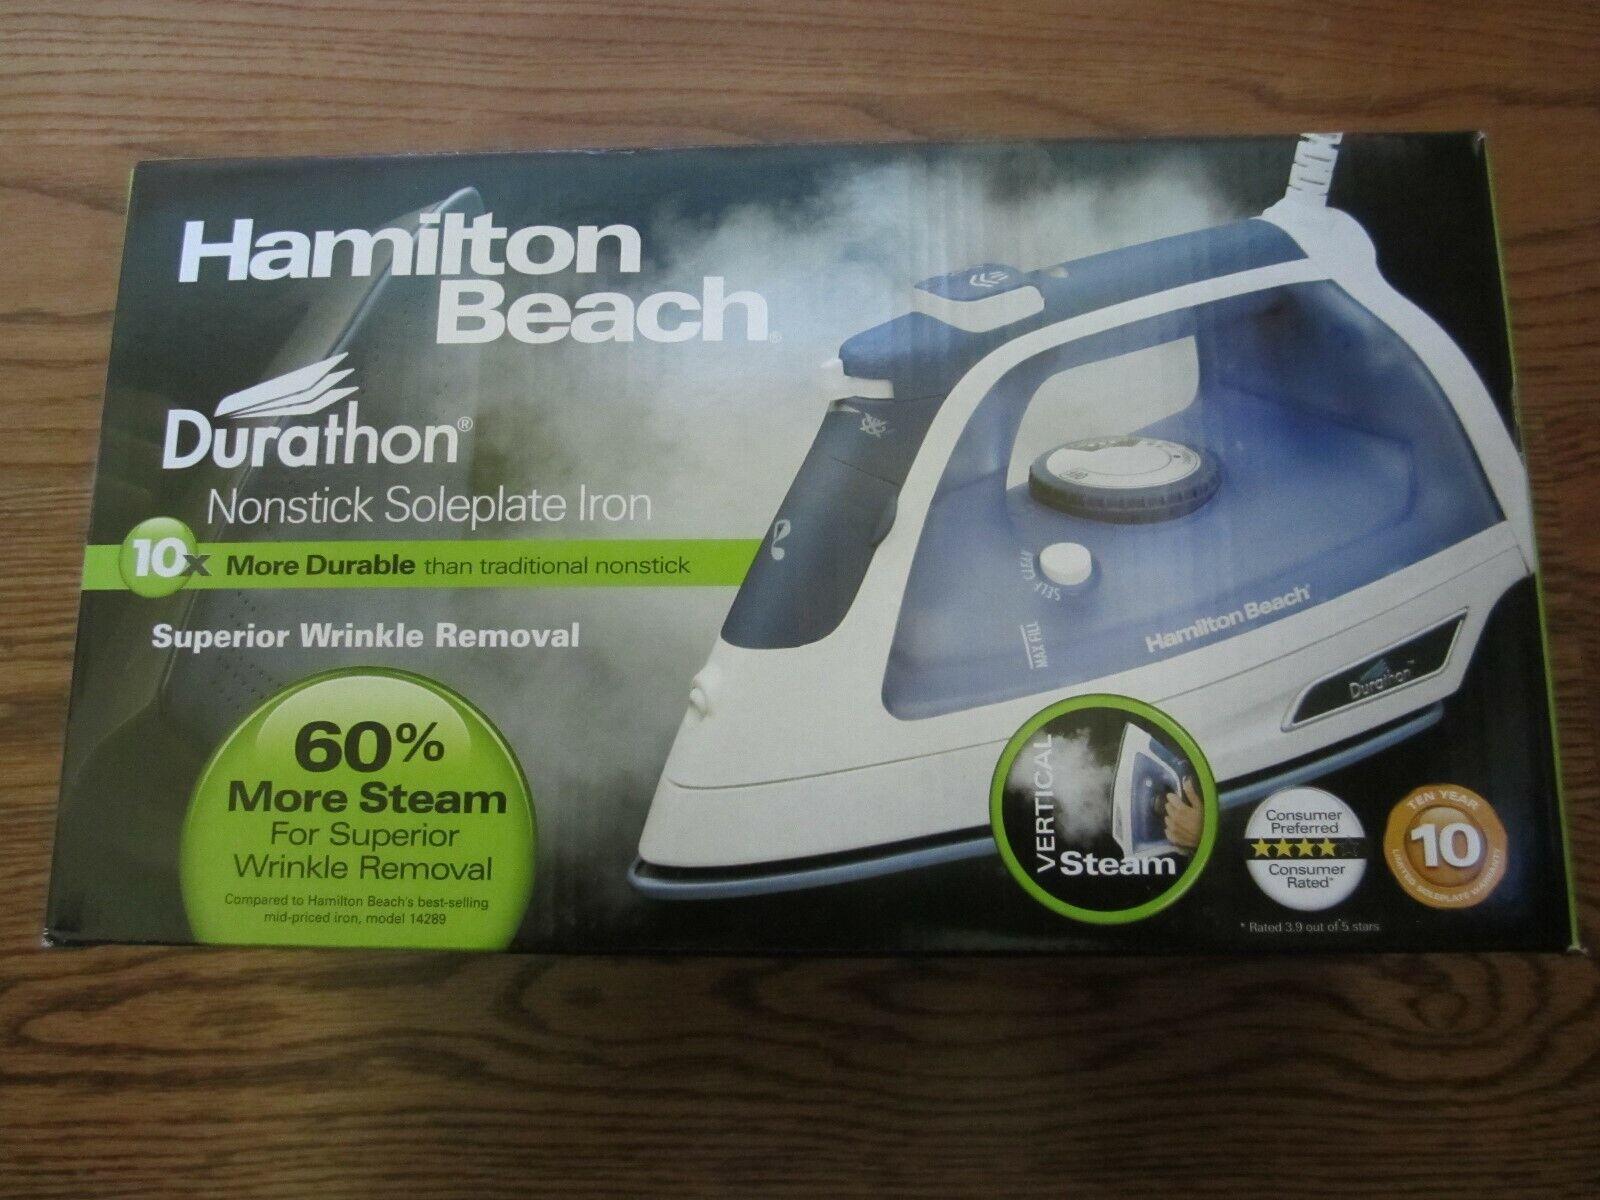 Hamilton Beach Durathon Full Size Iron, 1 Each